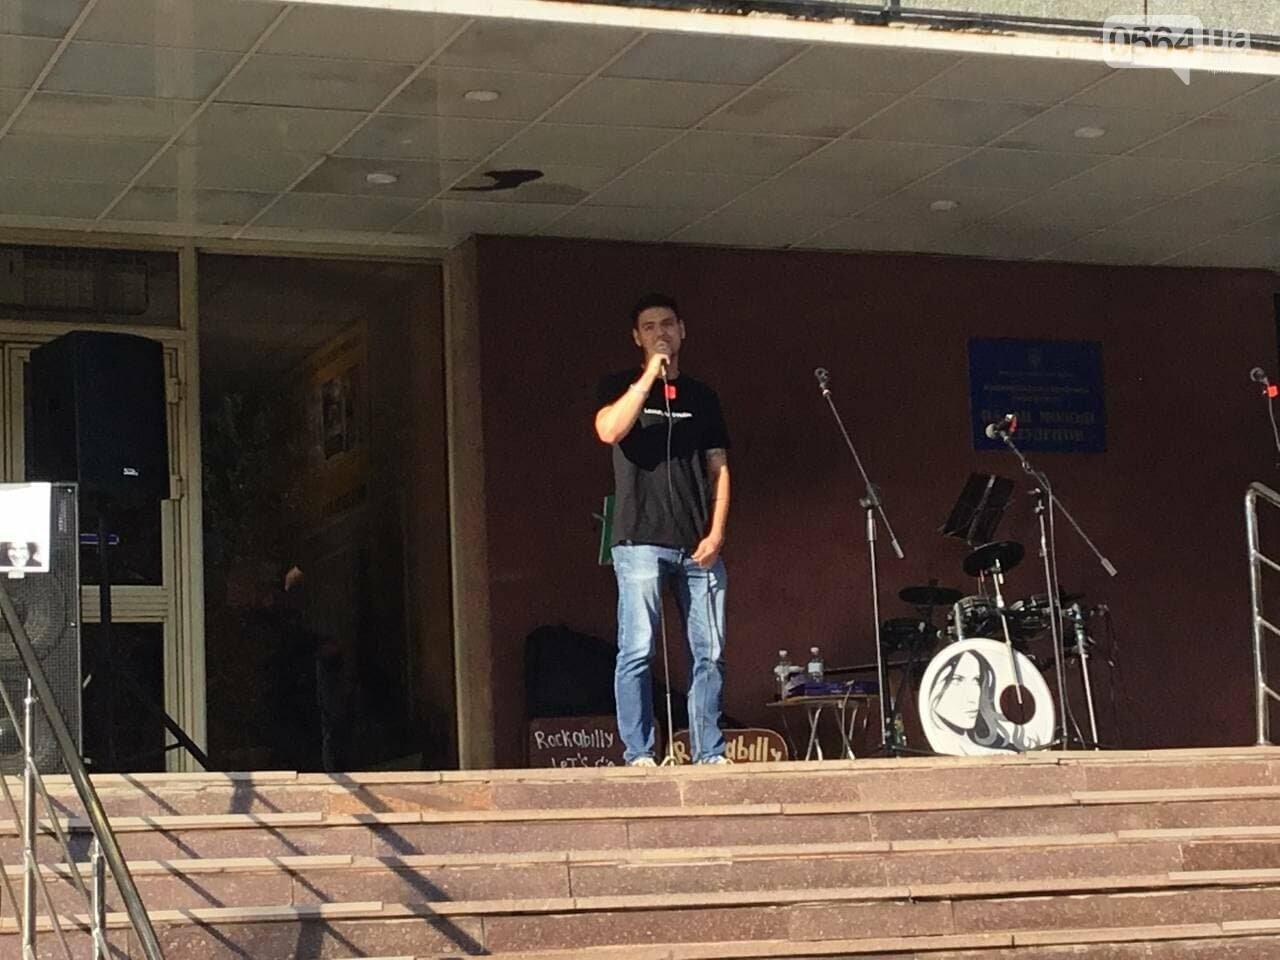 18 конкурсантов представили своё творчество на 5-м Криворожском фестивале имени Кузьмы Скрябина, - ФОТО, ВИДЕО, фото-15